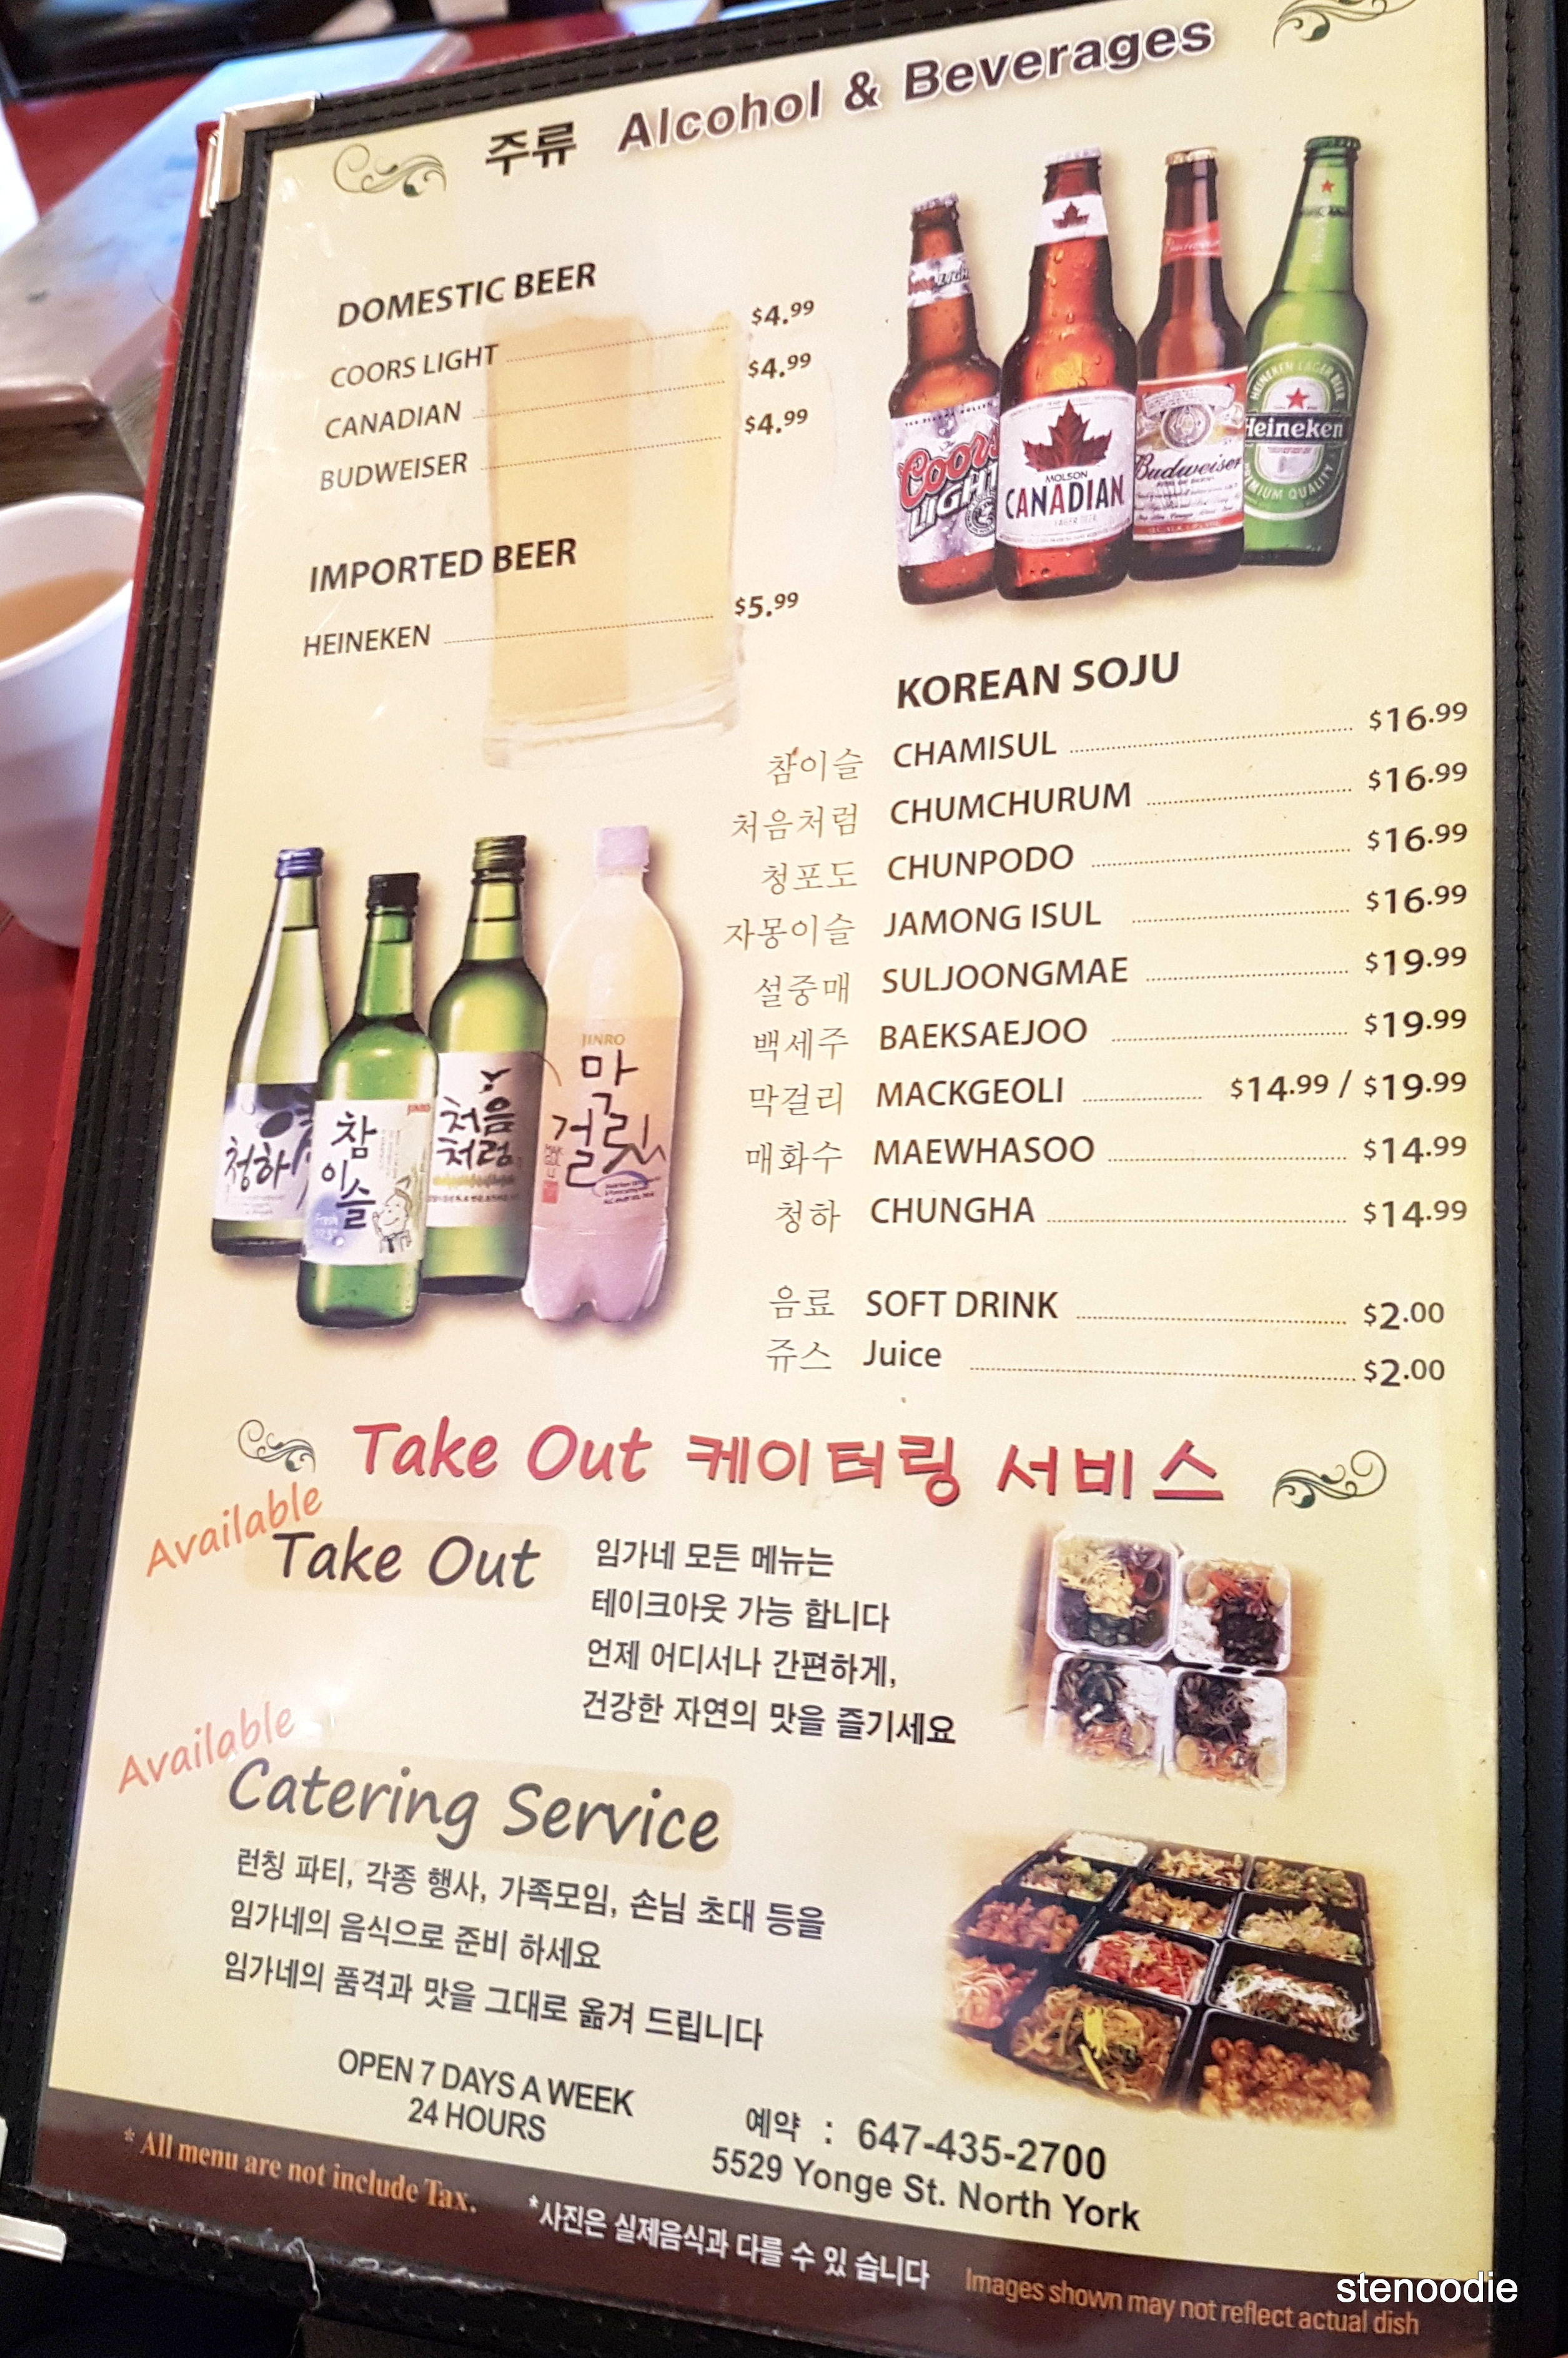 Lim Ga Ne Yonge and Finch menu and prices